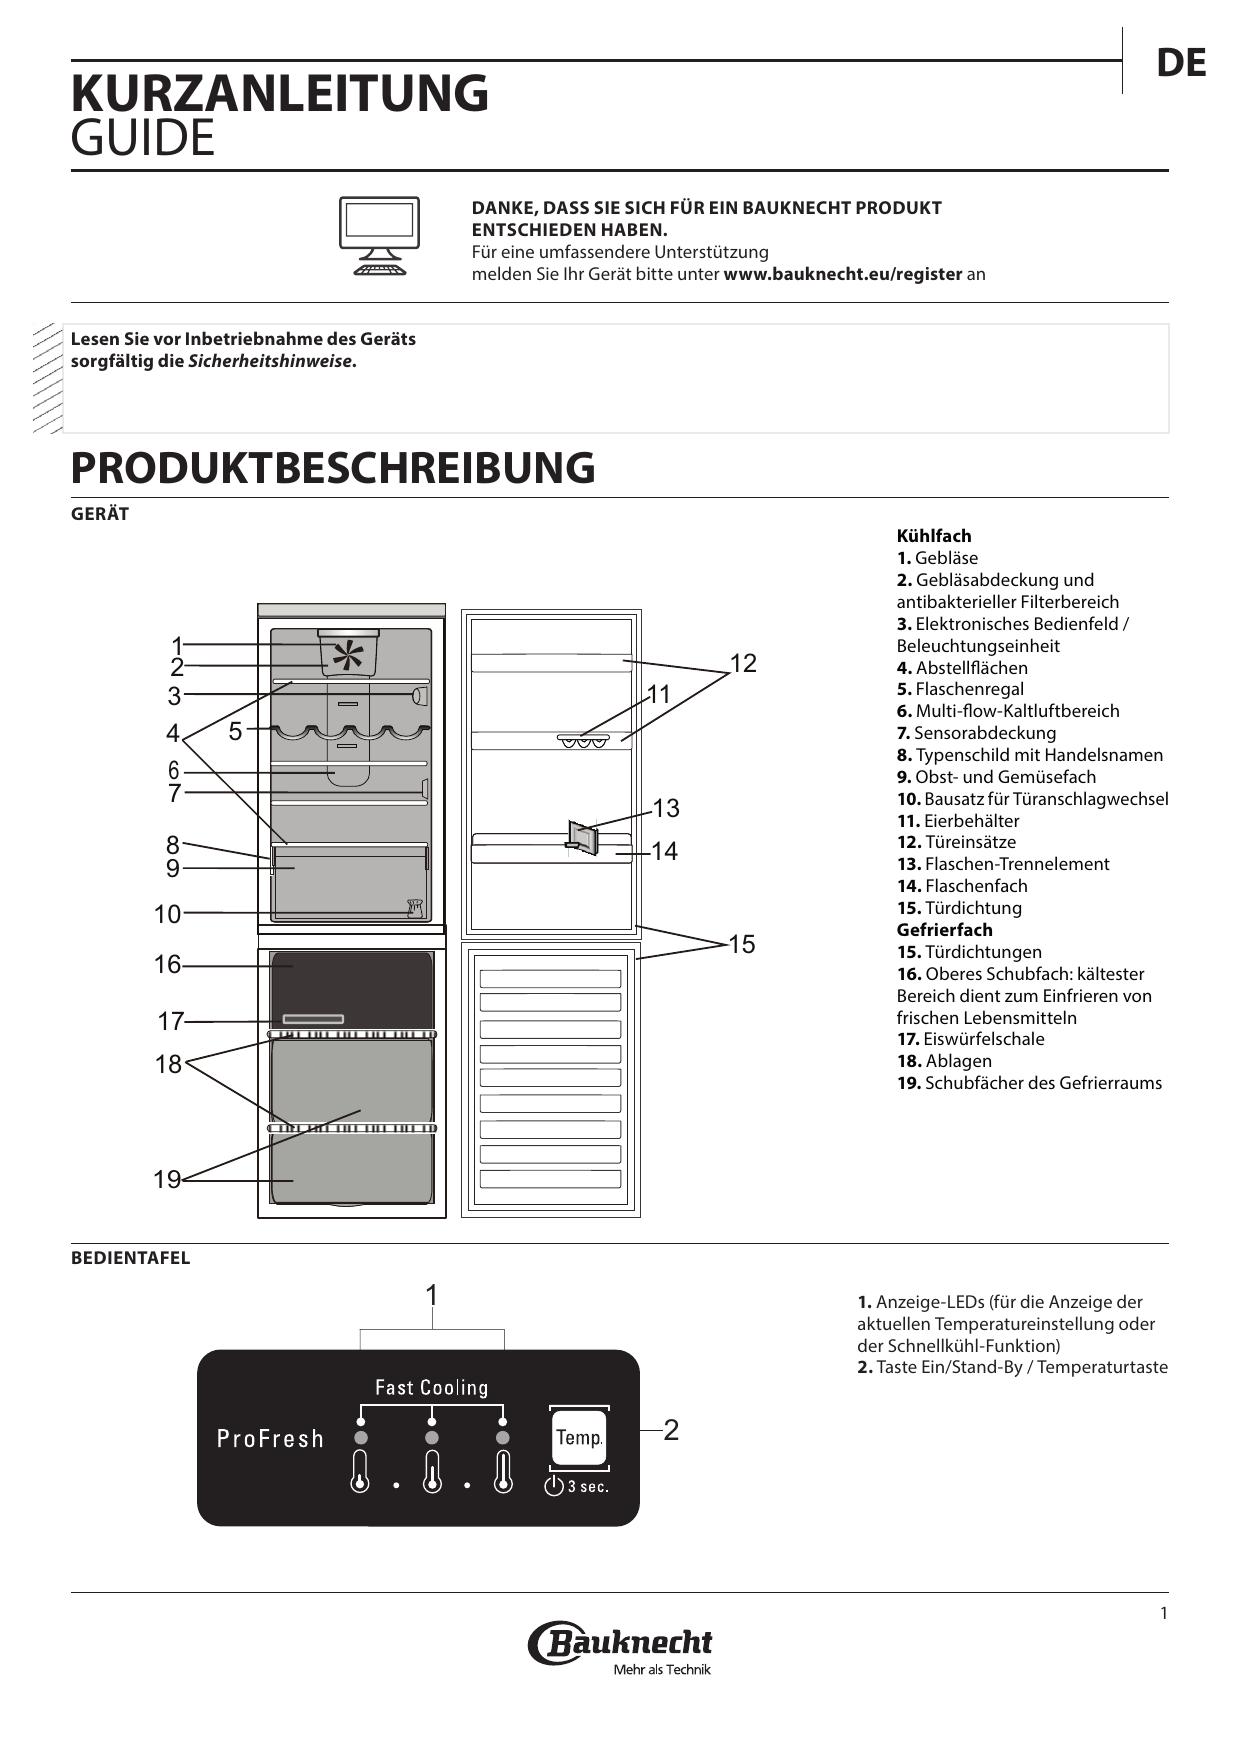 Bauknecht Kgnfi 18 A2 In Setup And User Guide Manualzzcom